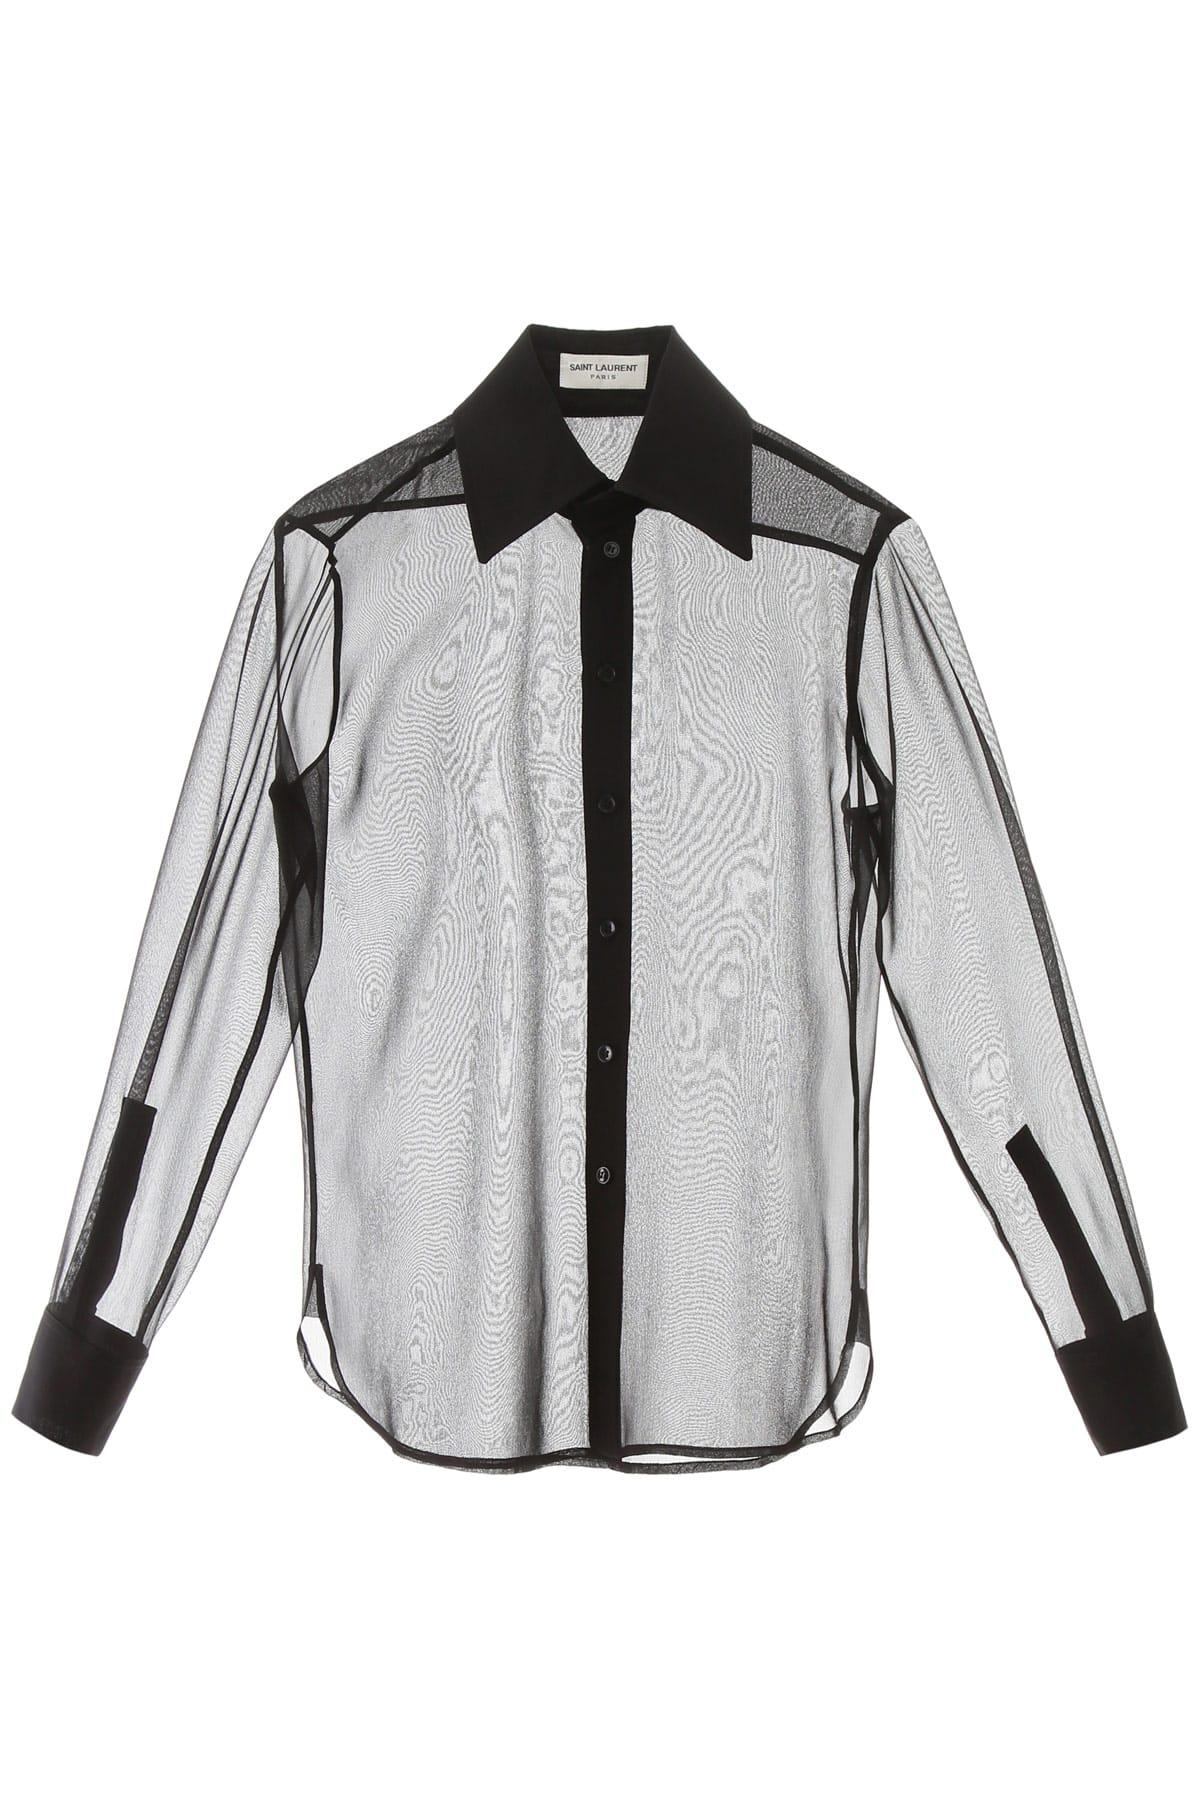 SAINT LAURENT CHIFFON SHIRT 40 Black Silk